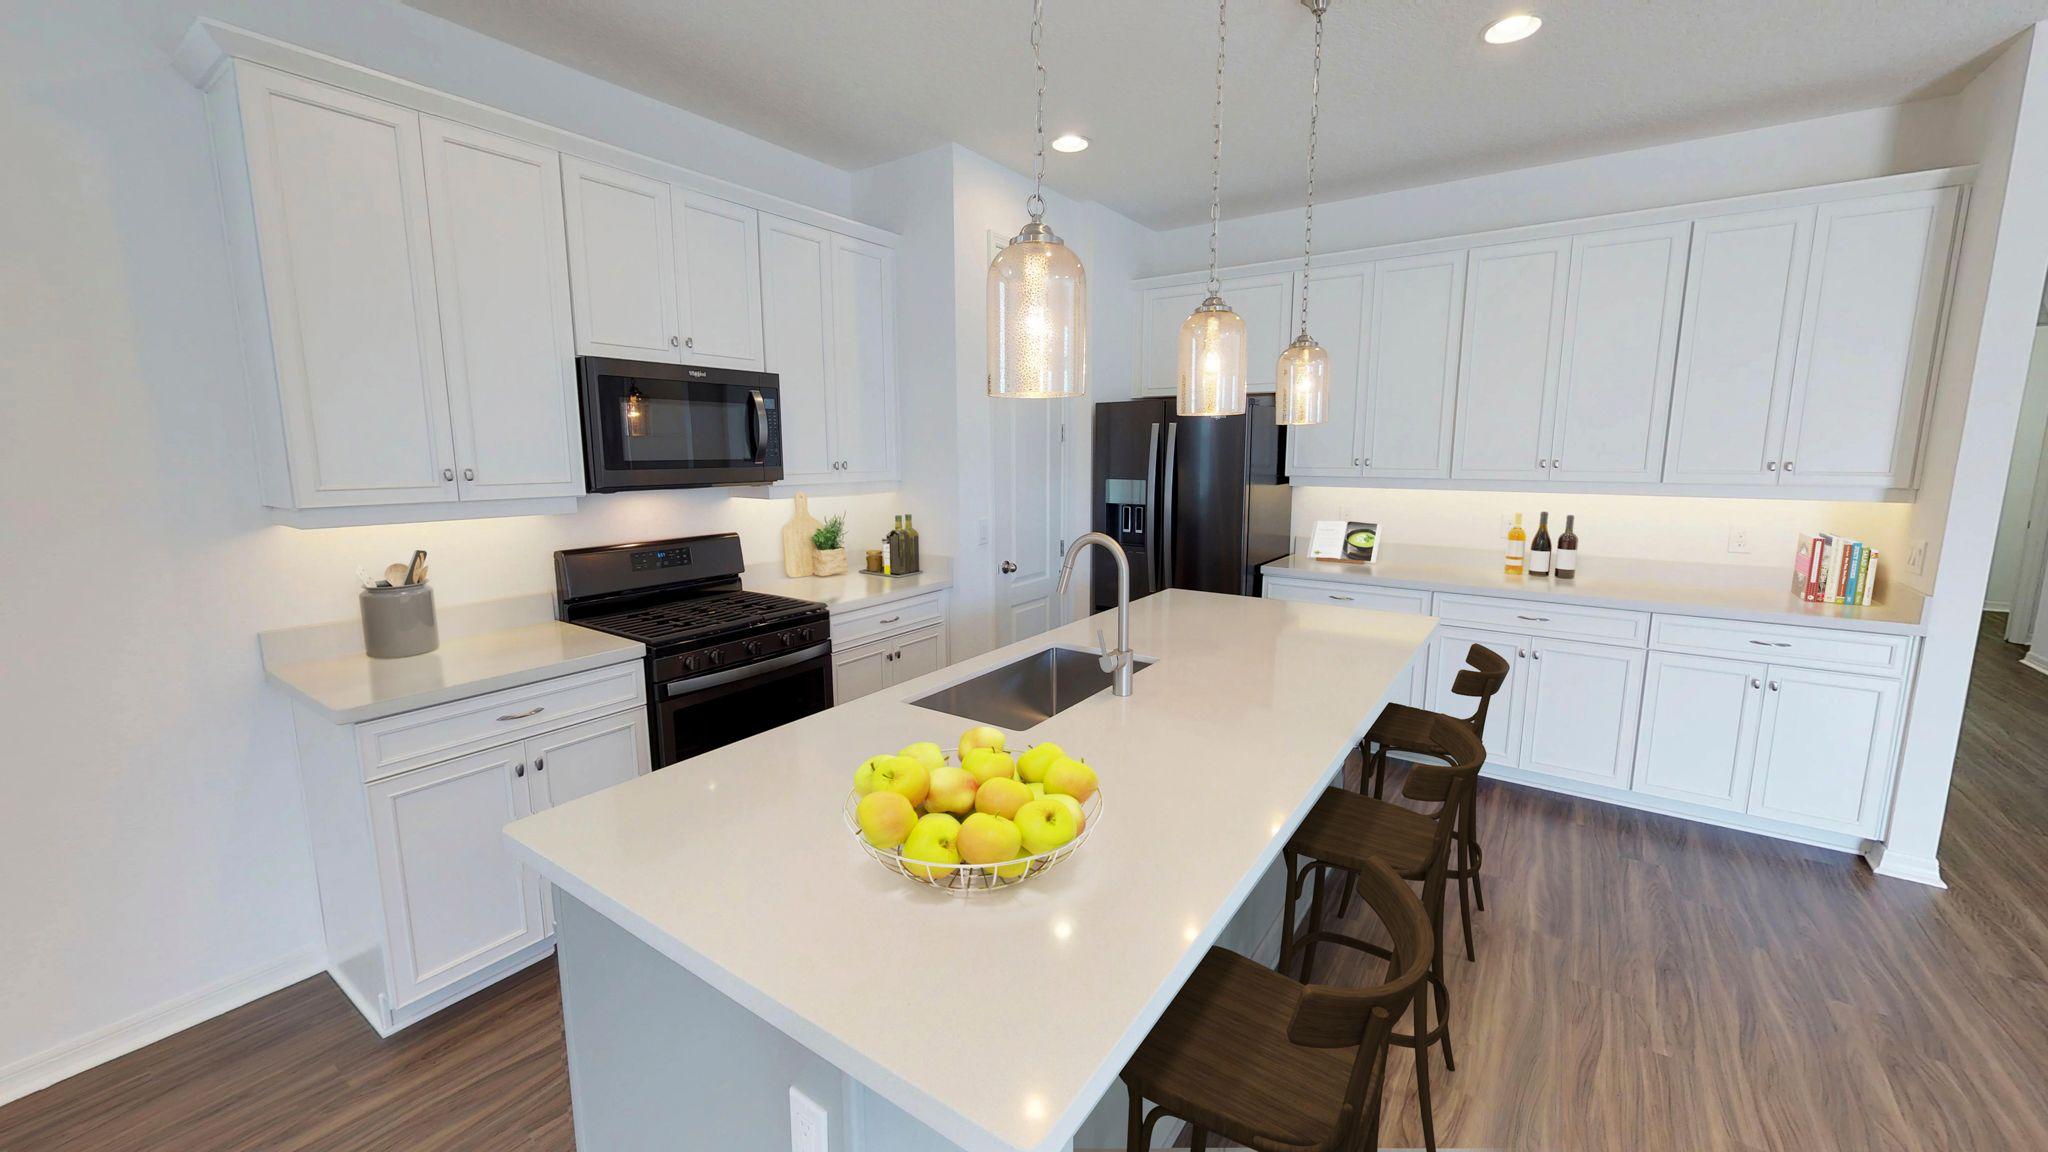 Kitchen featured in the Berkeley II By Ashton Woods in Orlando, FL